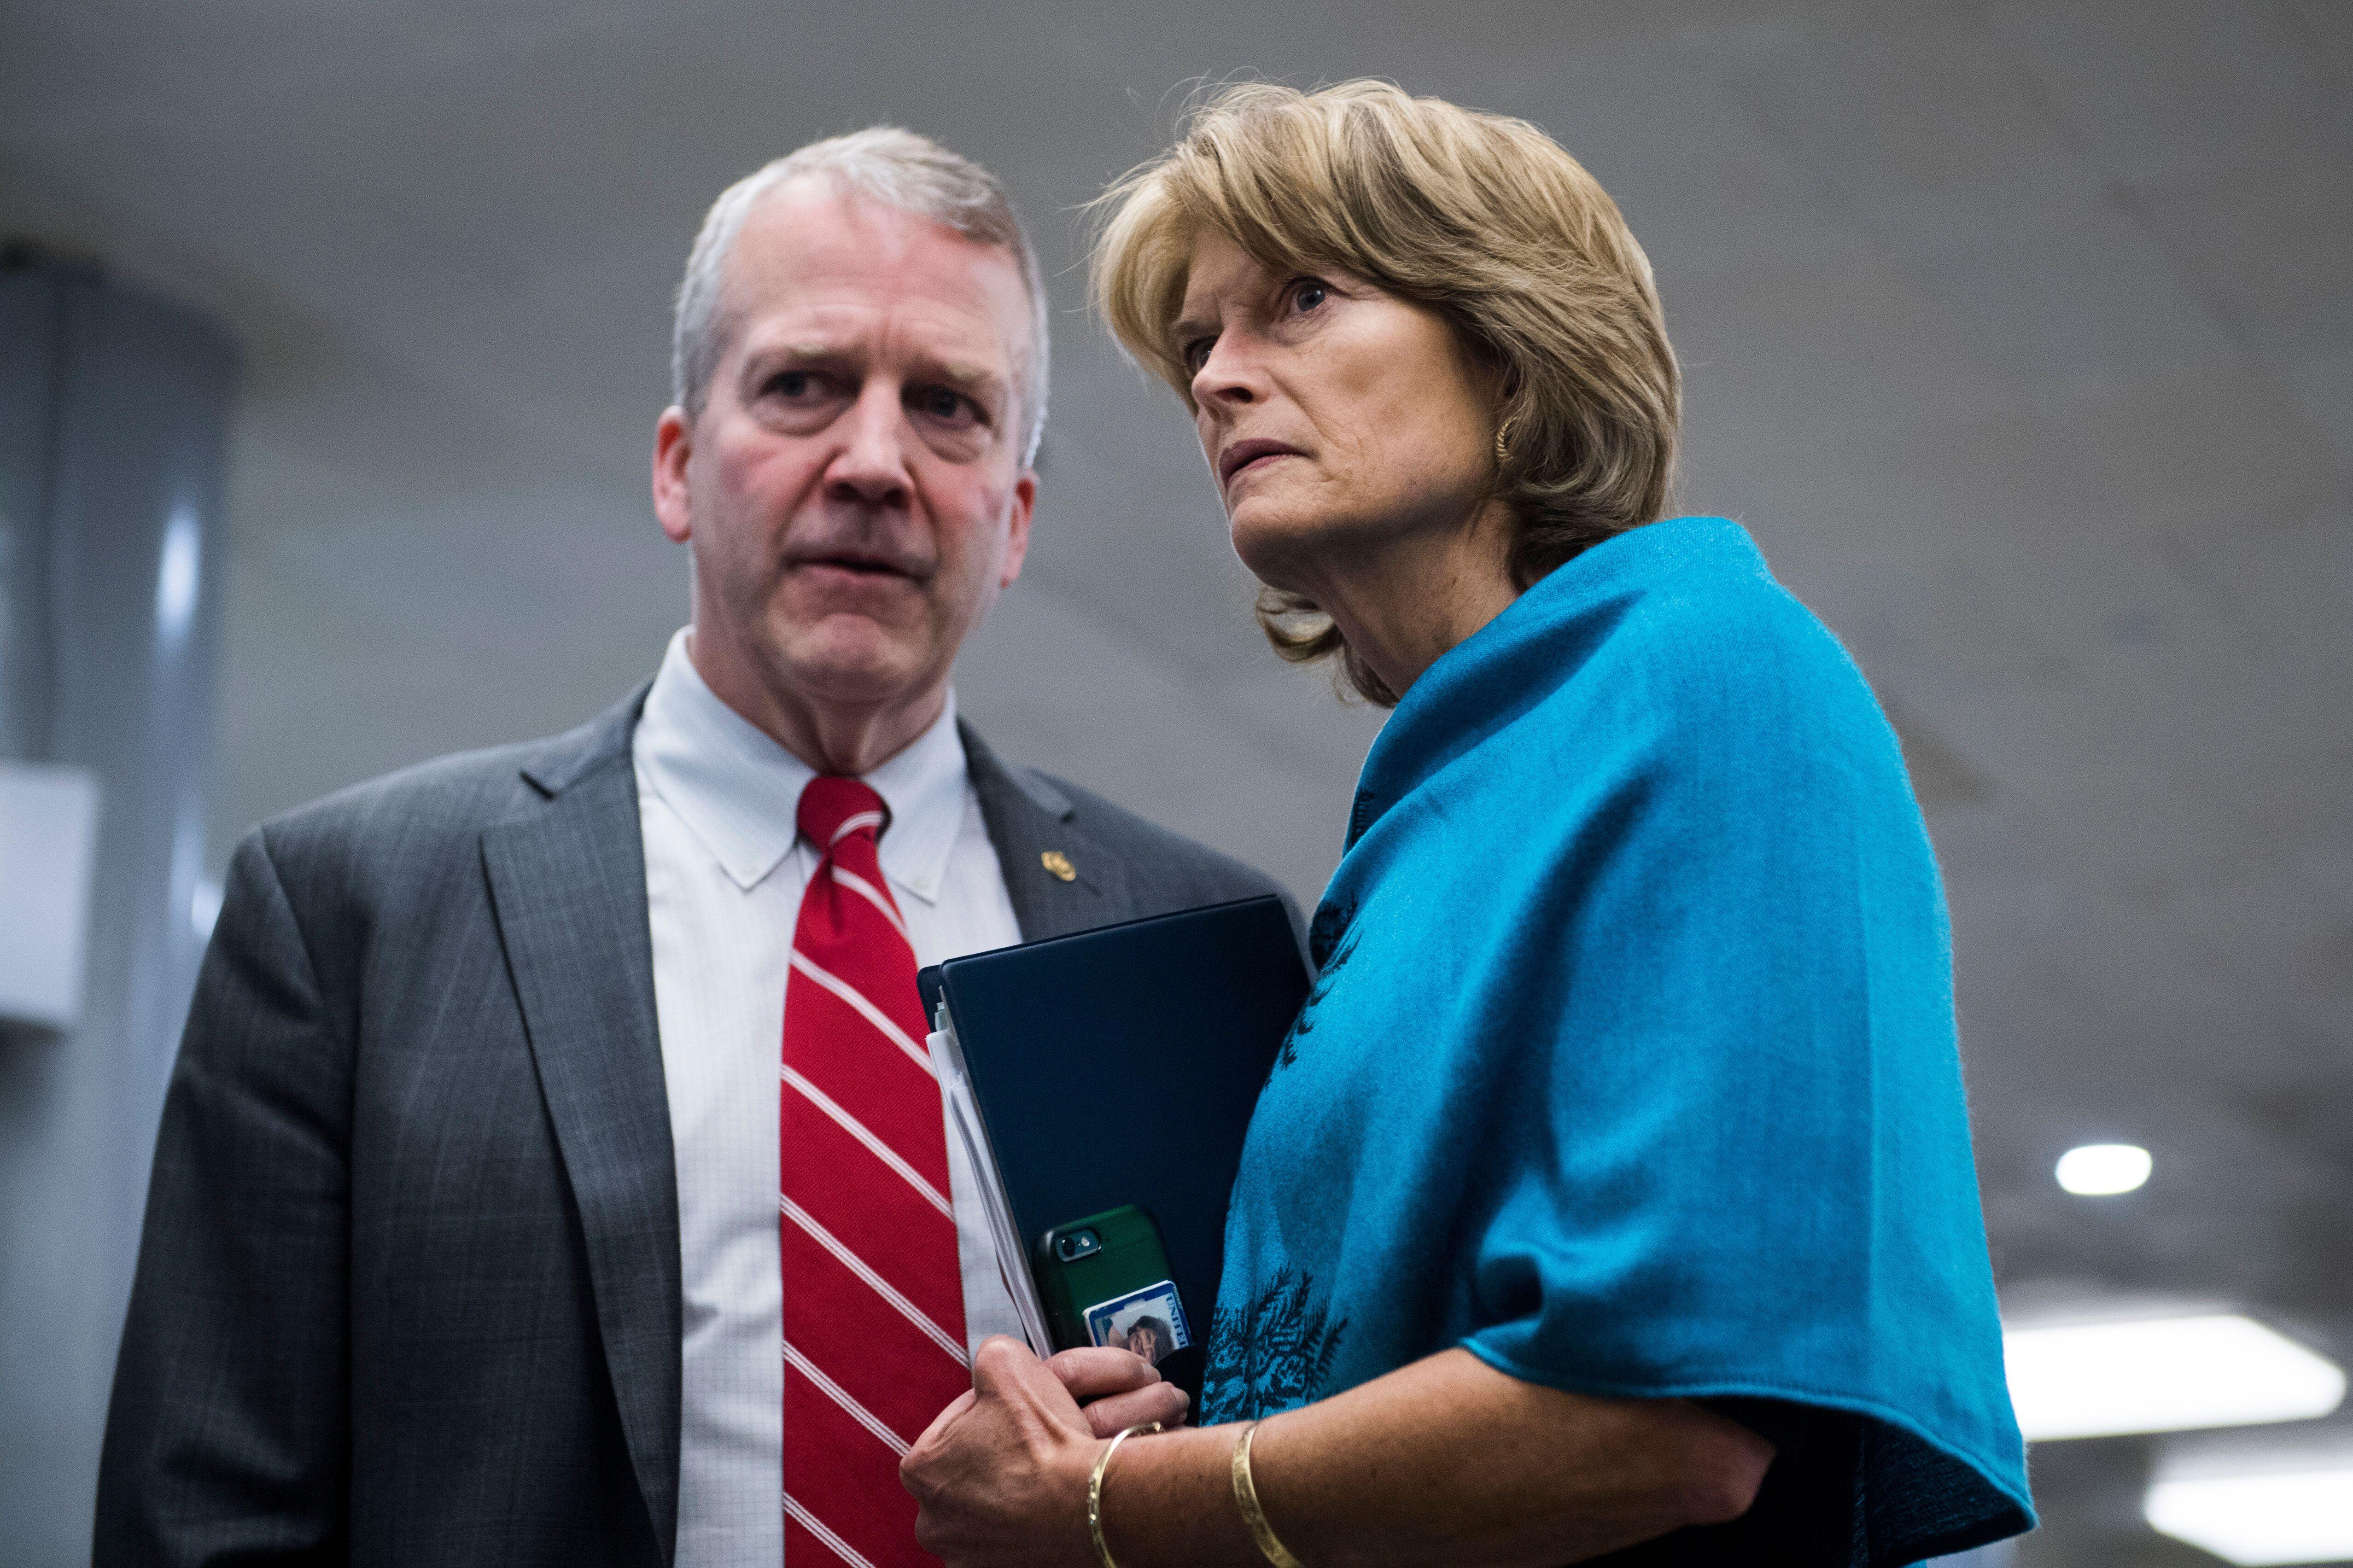 Sens. Dan Sullivan and Lisa Murkowski, Alaska Republicans, consult on Capitol Hill. Murkowski has a more moderate record, inc